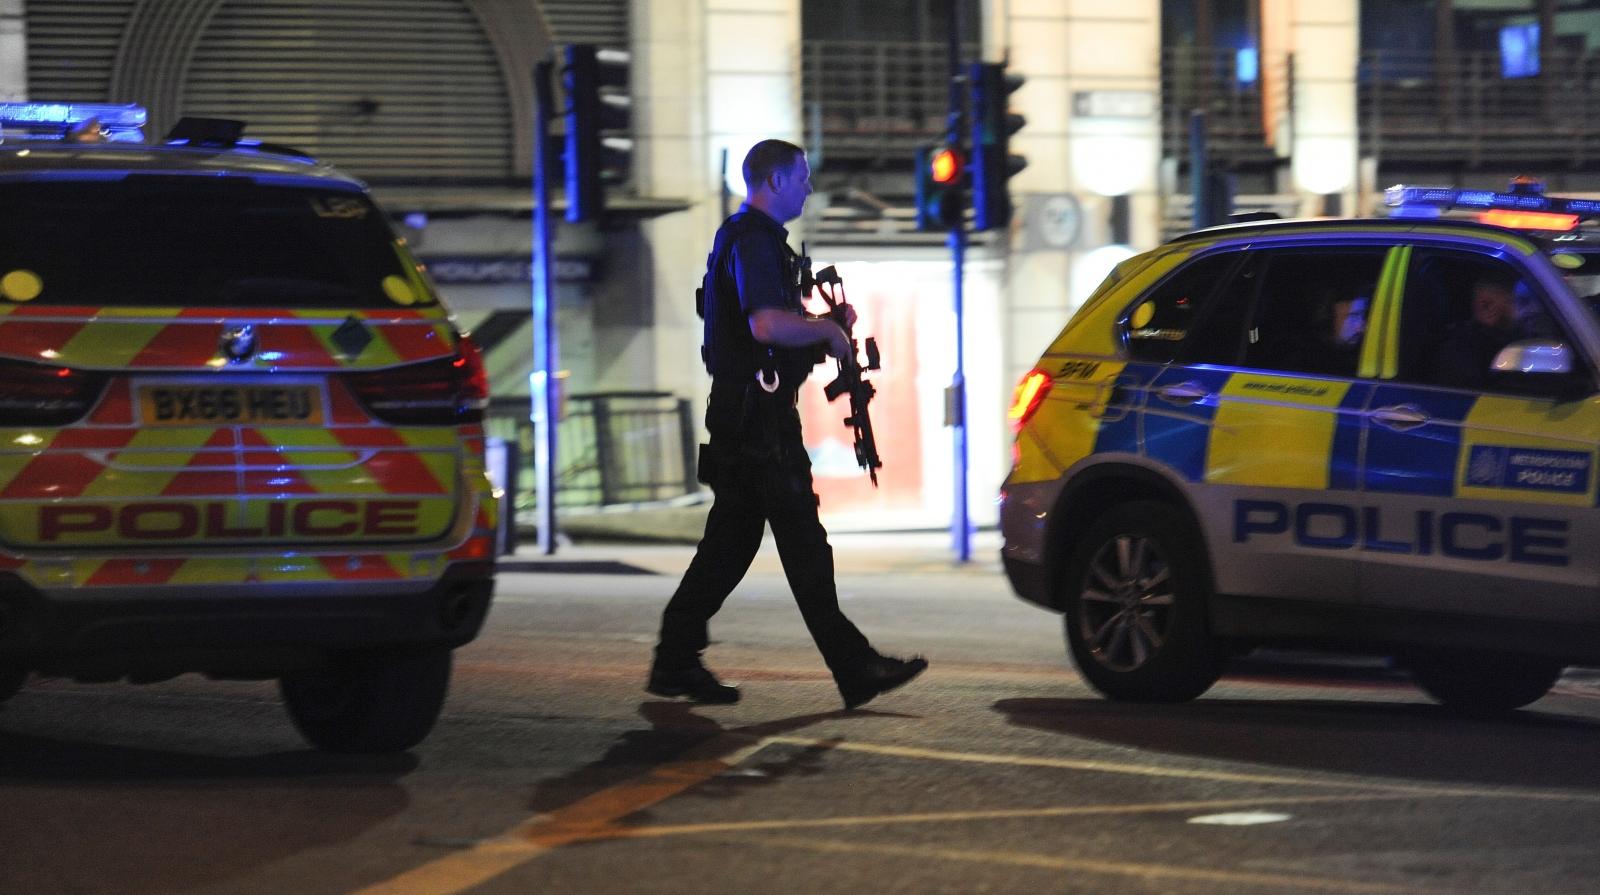 Image result for june 3, 2017 london bridge attack map 8 minutes